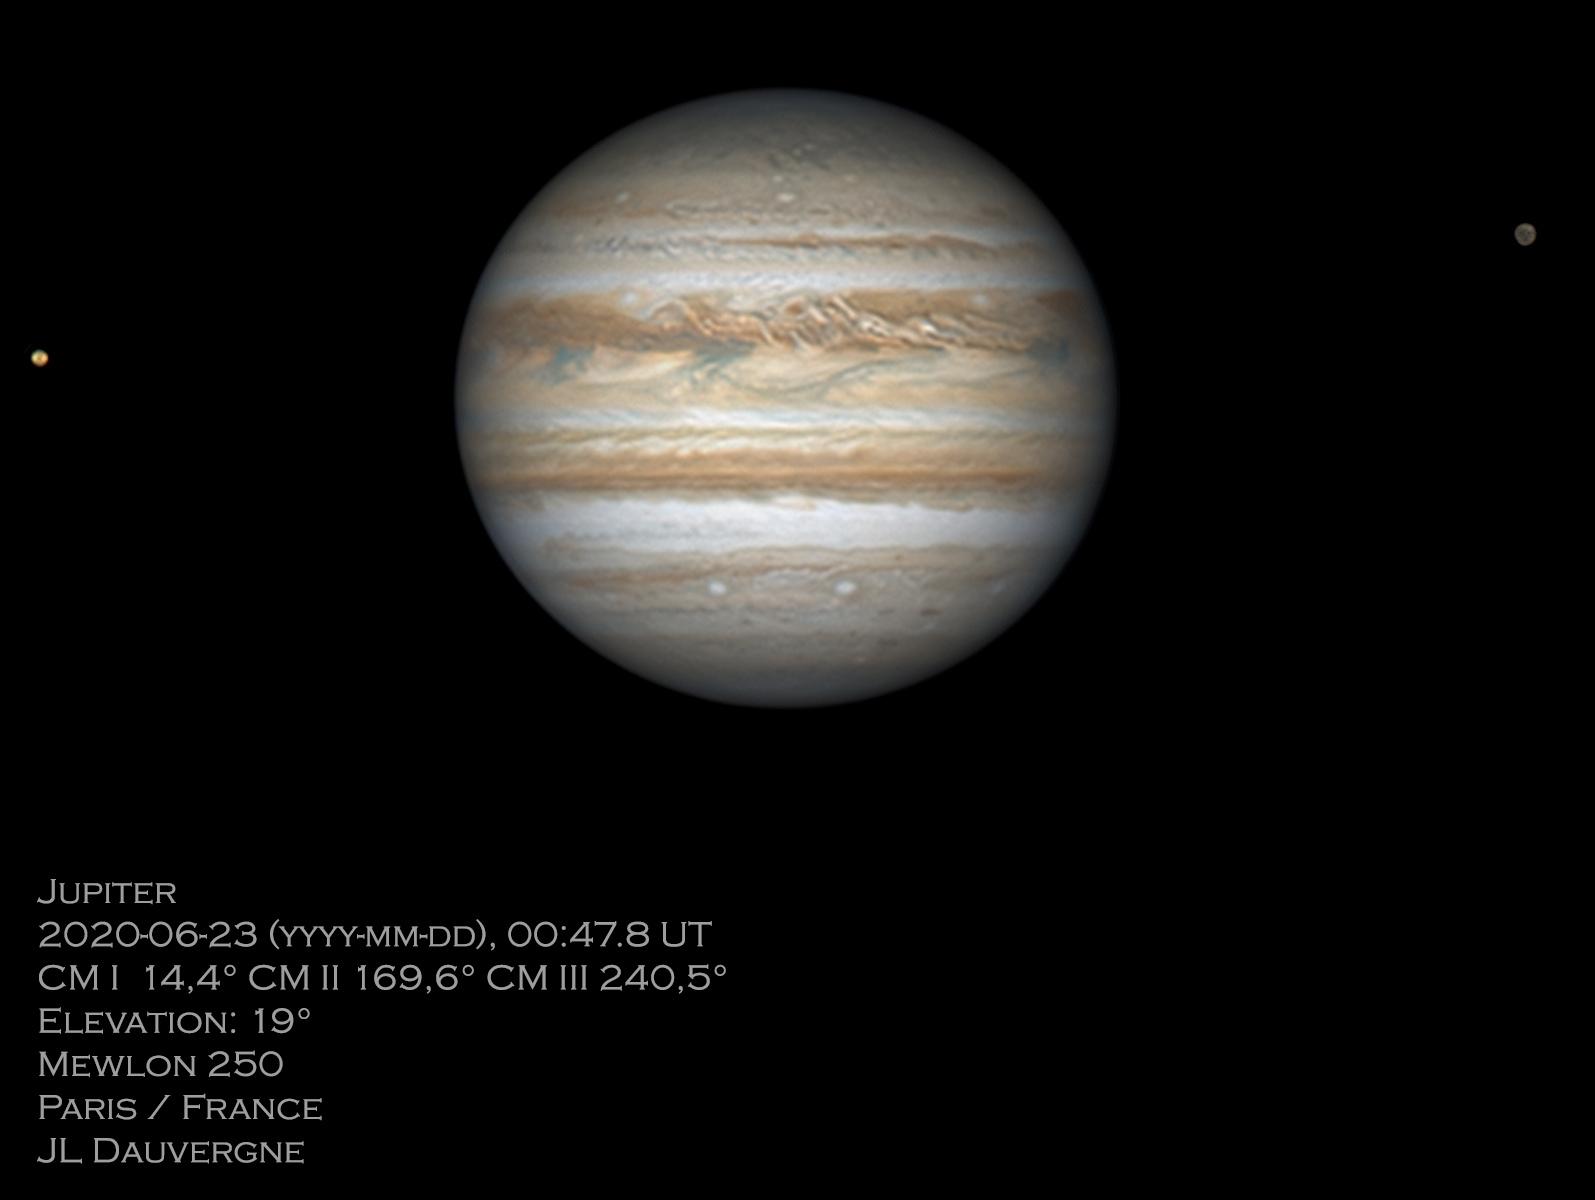 5f0237bd2ee3a_2020-06-23-0047_8-L2-Jupiter_ZWOASI290MMMini_lapl5_ap274AST.jpg.930d199163b69528e853e5af3e661d7c.jpg